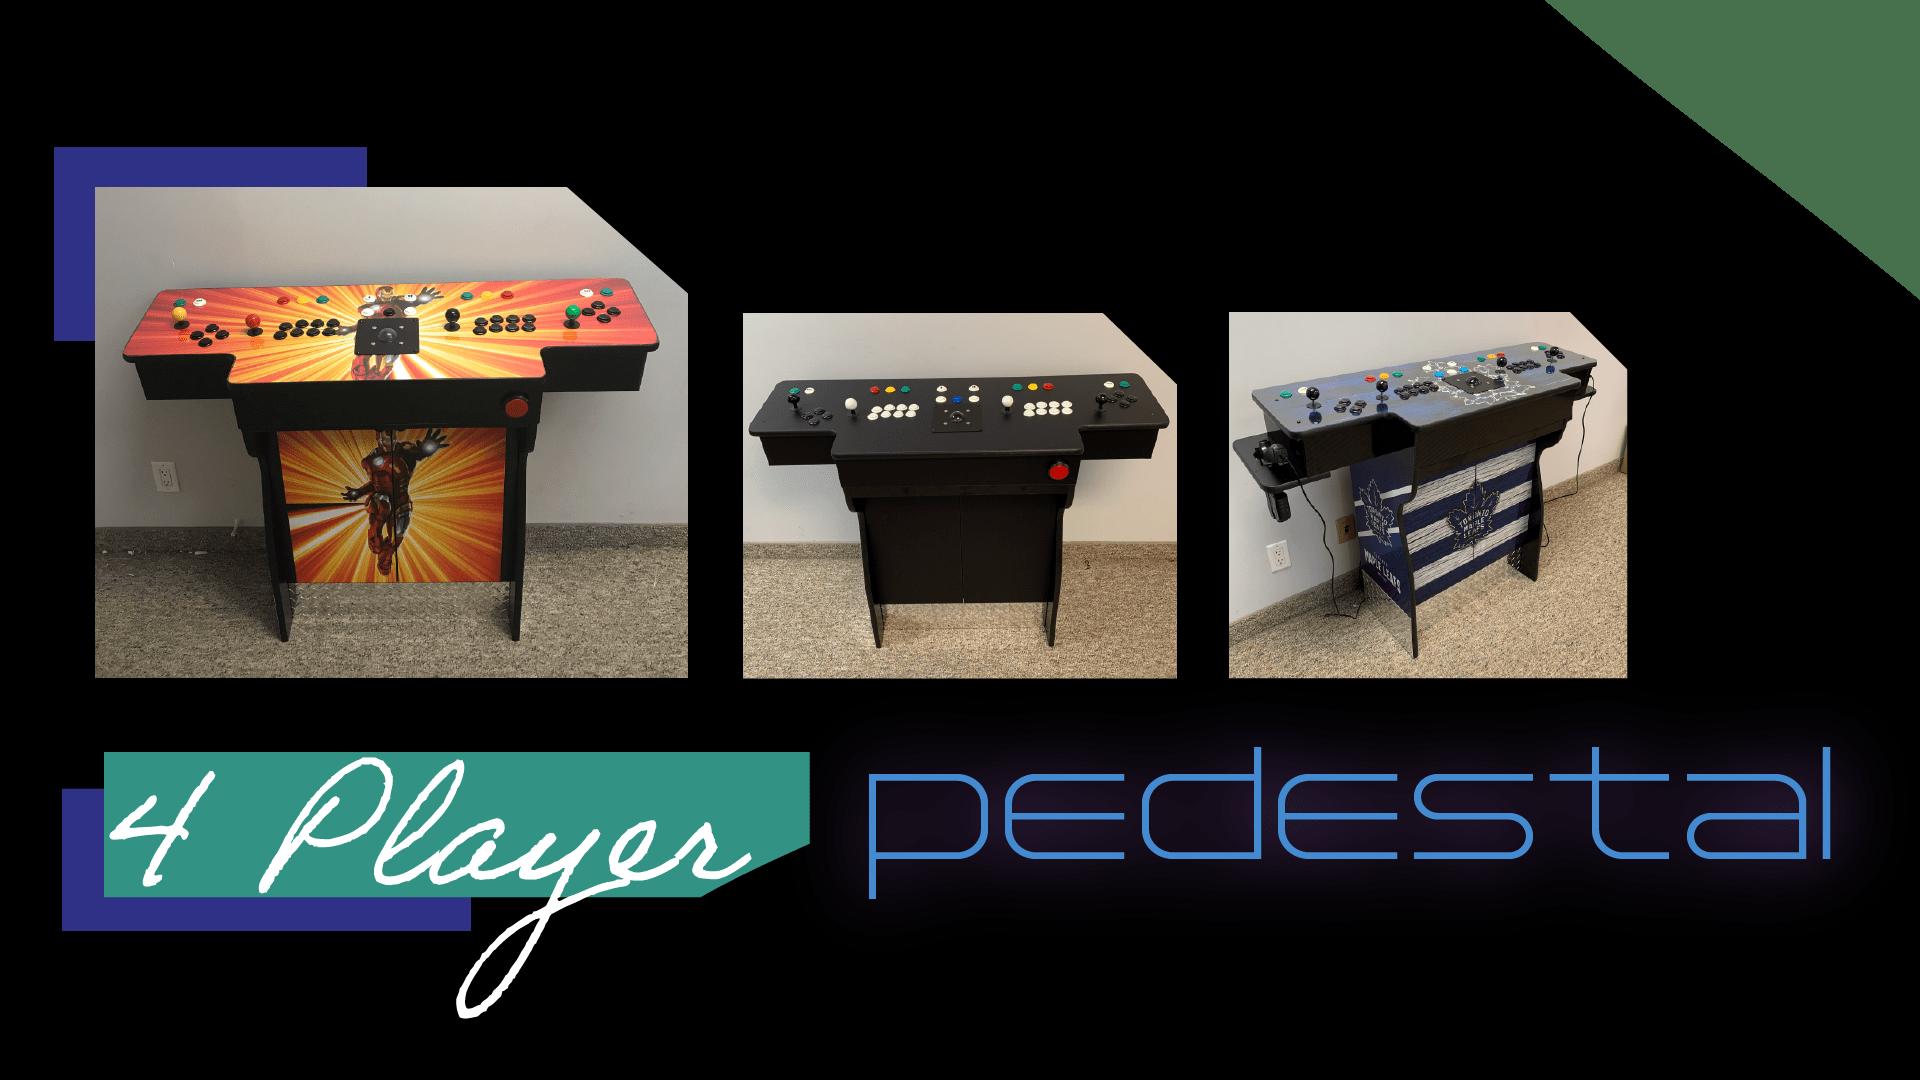 4 player pedestal-01